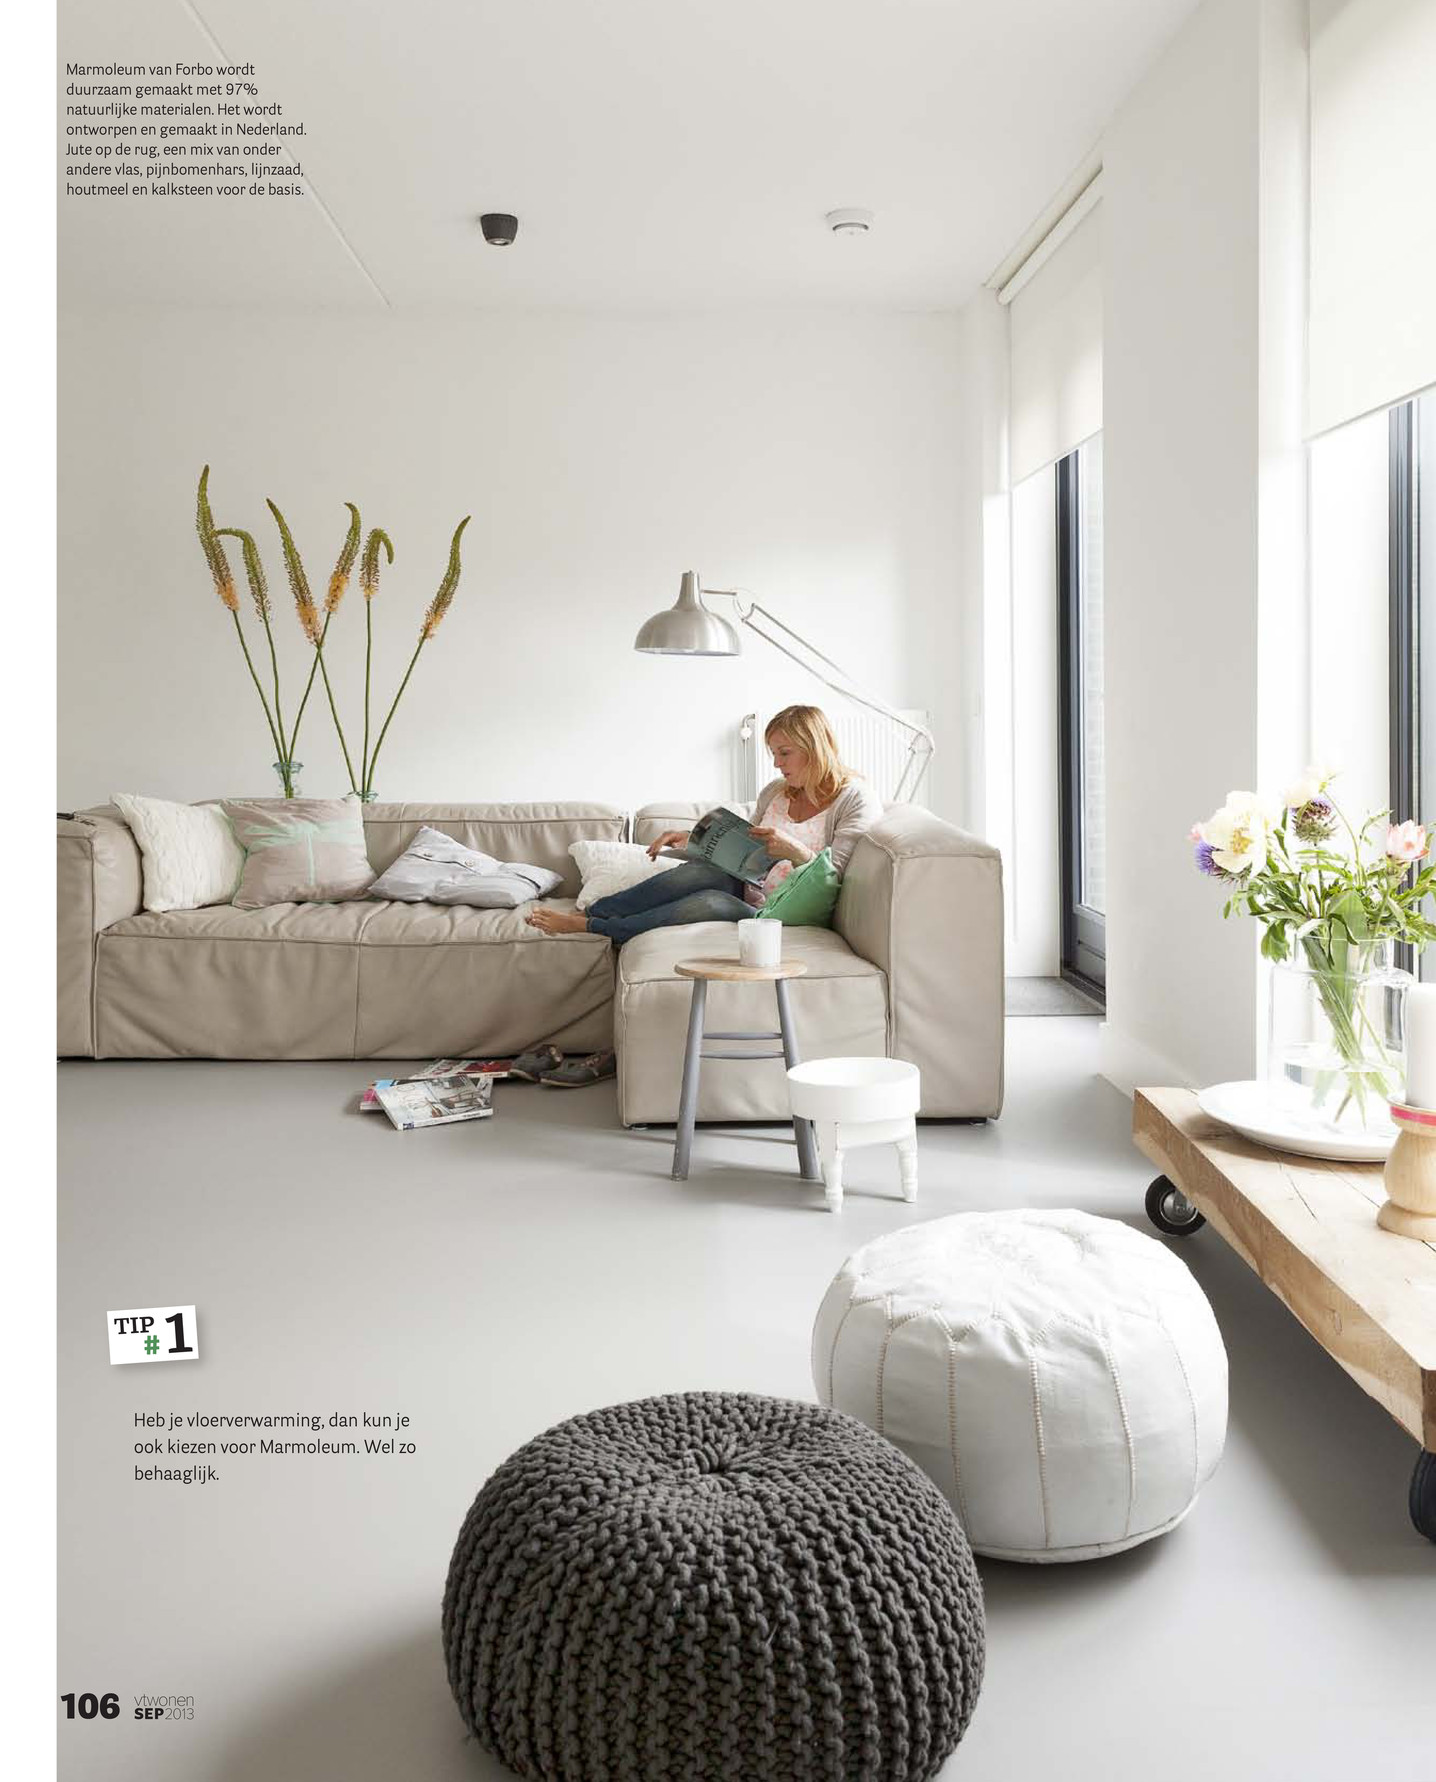 Forbo Flooring NL  VT wonen Woonwens 2013  Pagina 23